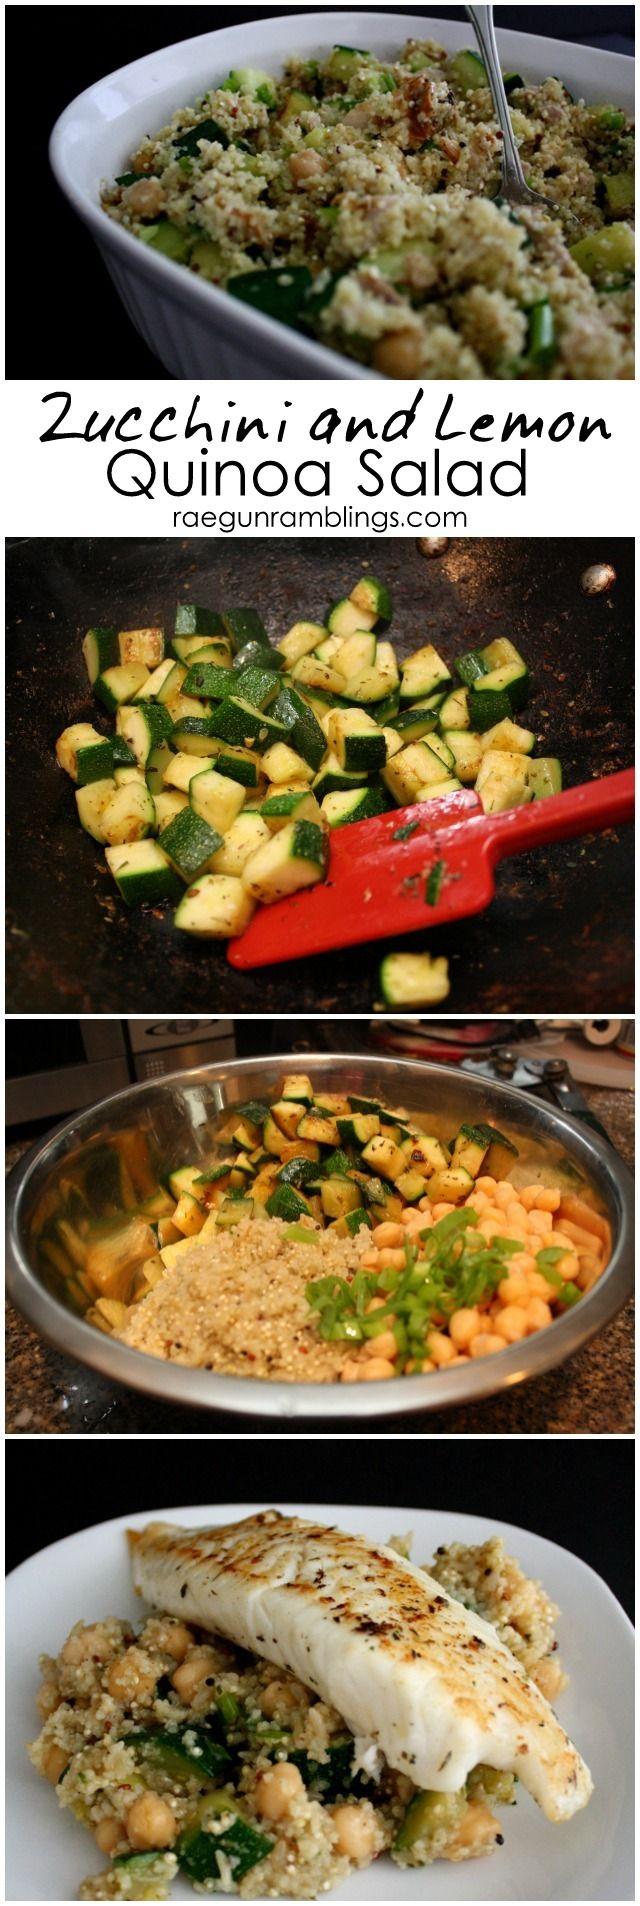 Delicious and fast zucchini quinoa salad recipe great healthy dinner idea- Rae Gun Ramblings